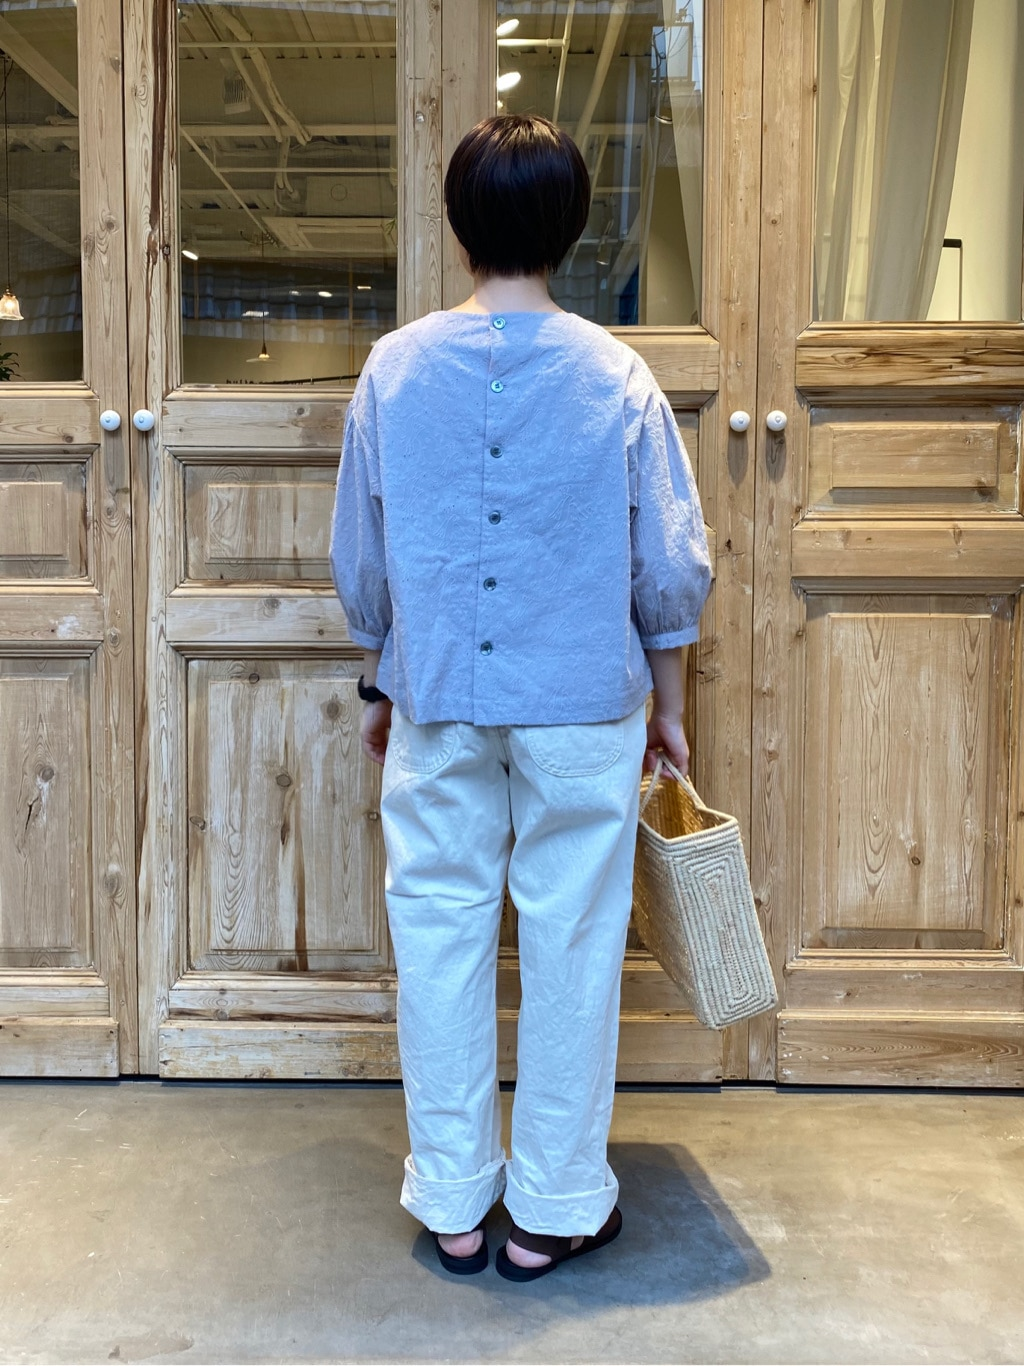 bulle de savon 阪急西宮ガーデンズ 身長:149cm 2021.05.18